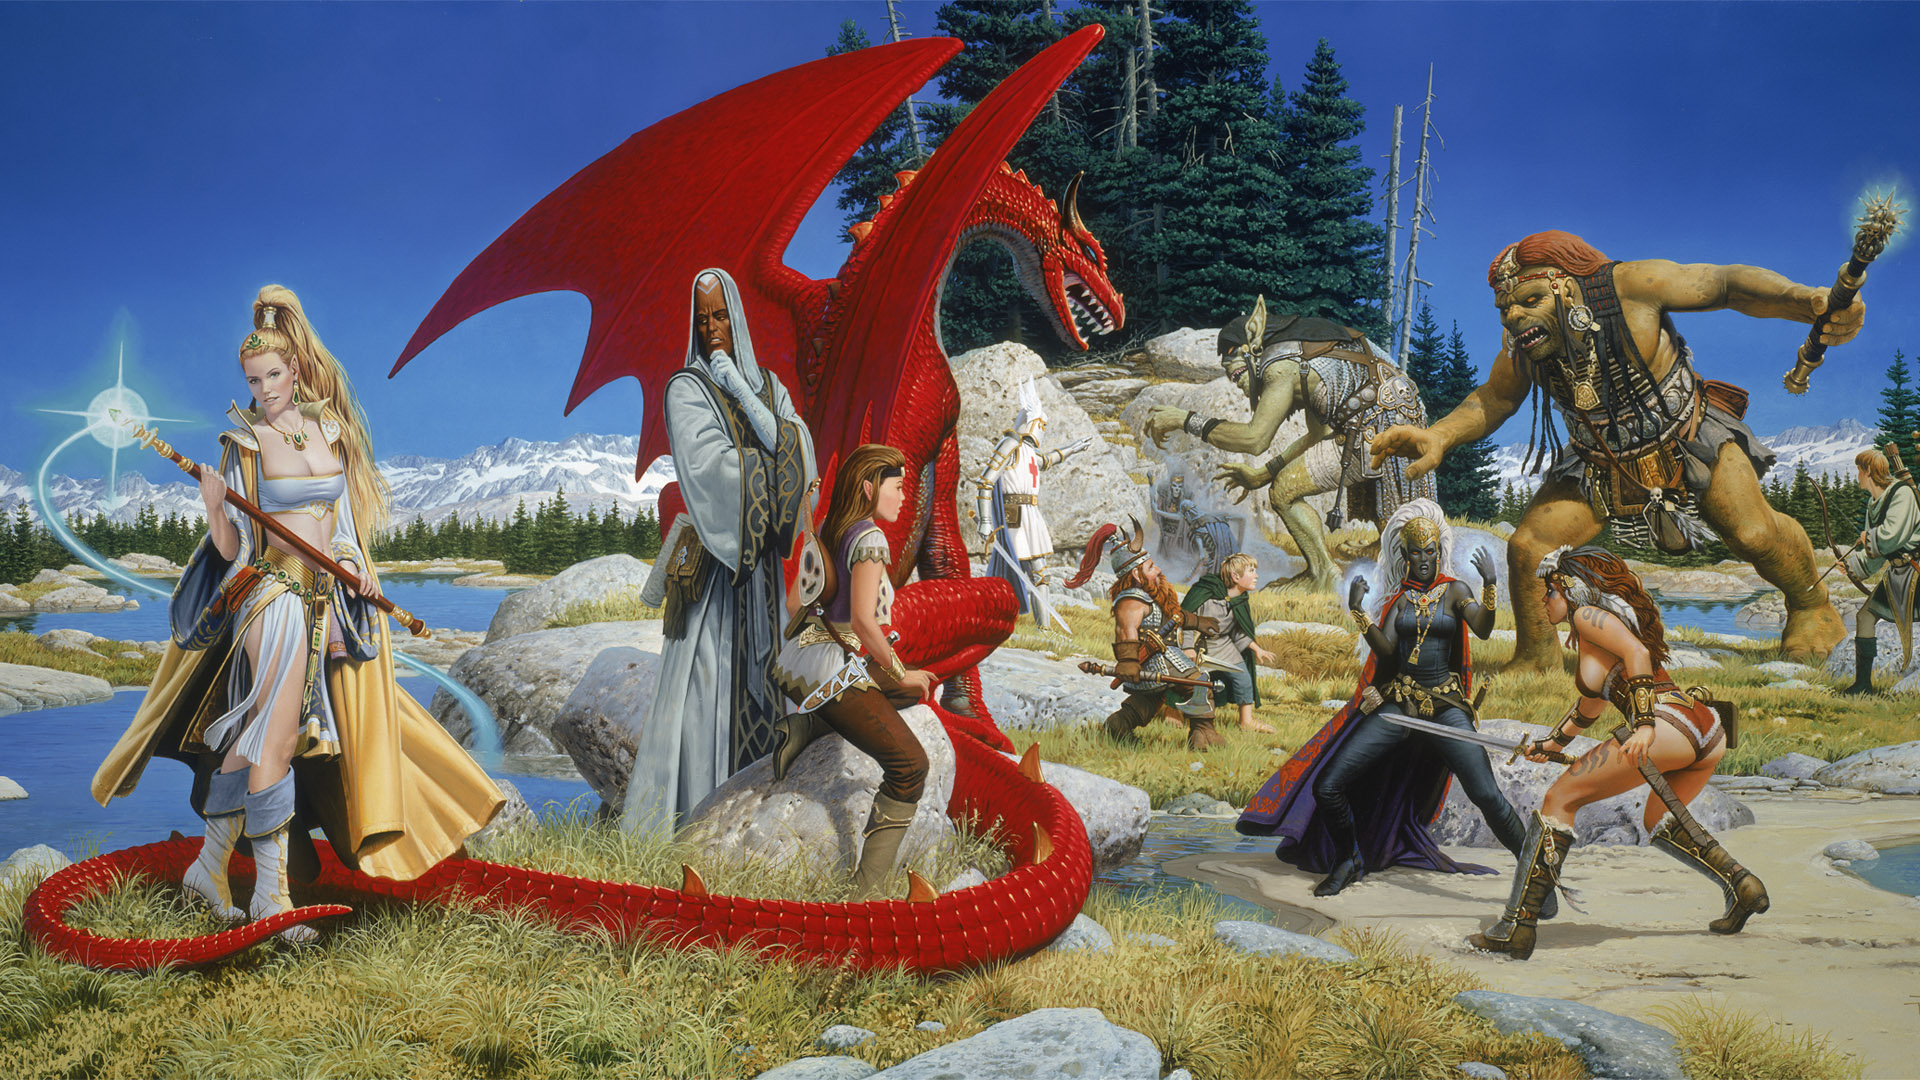 Everquest Artwork